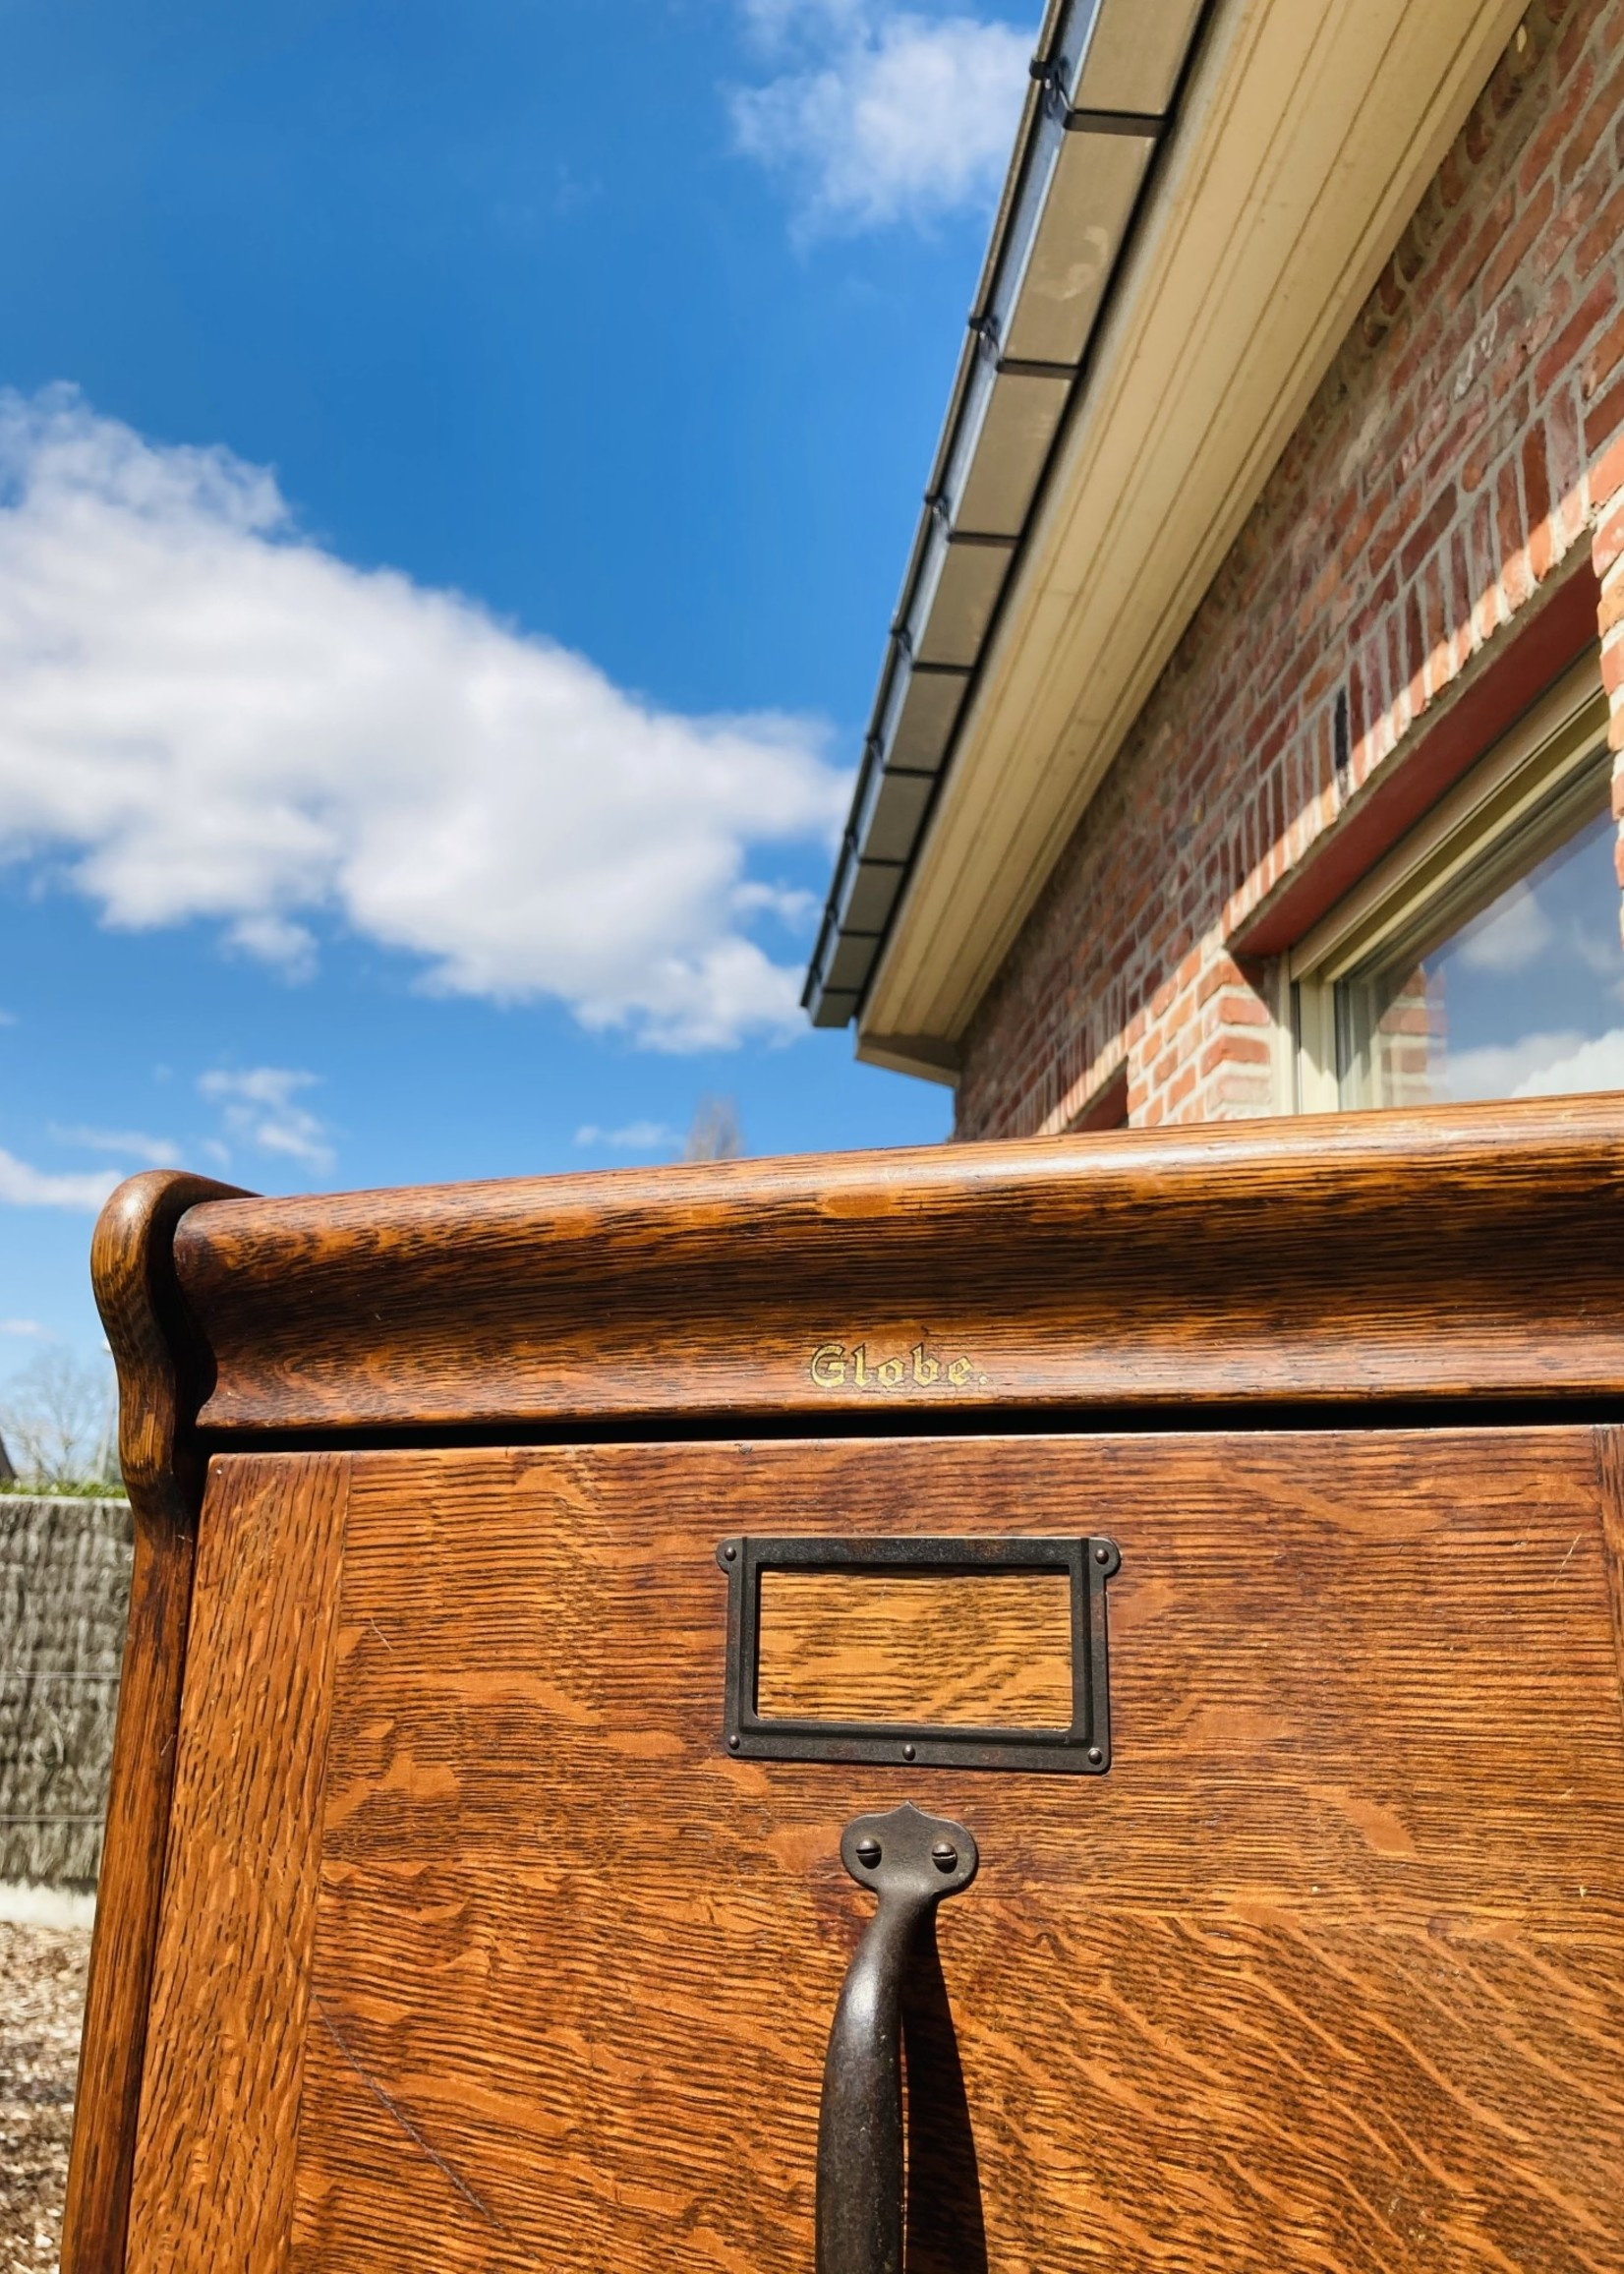 Wooden Archive Cabinet Globe Wecker